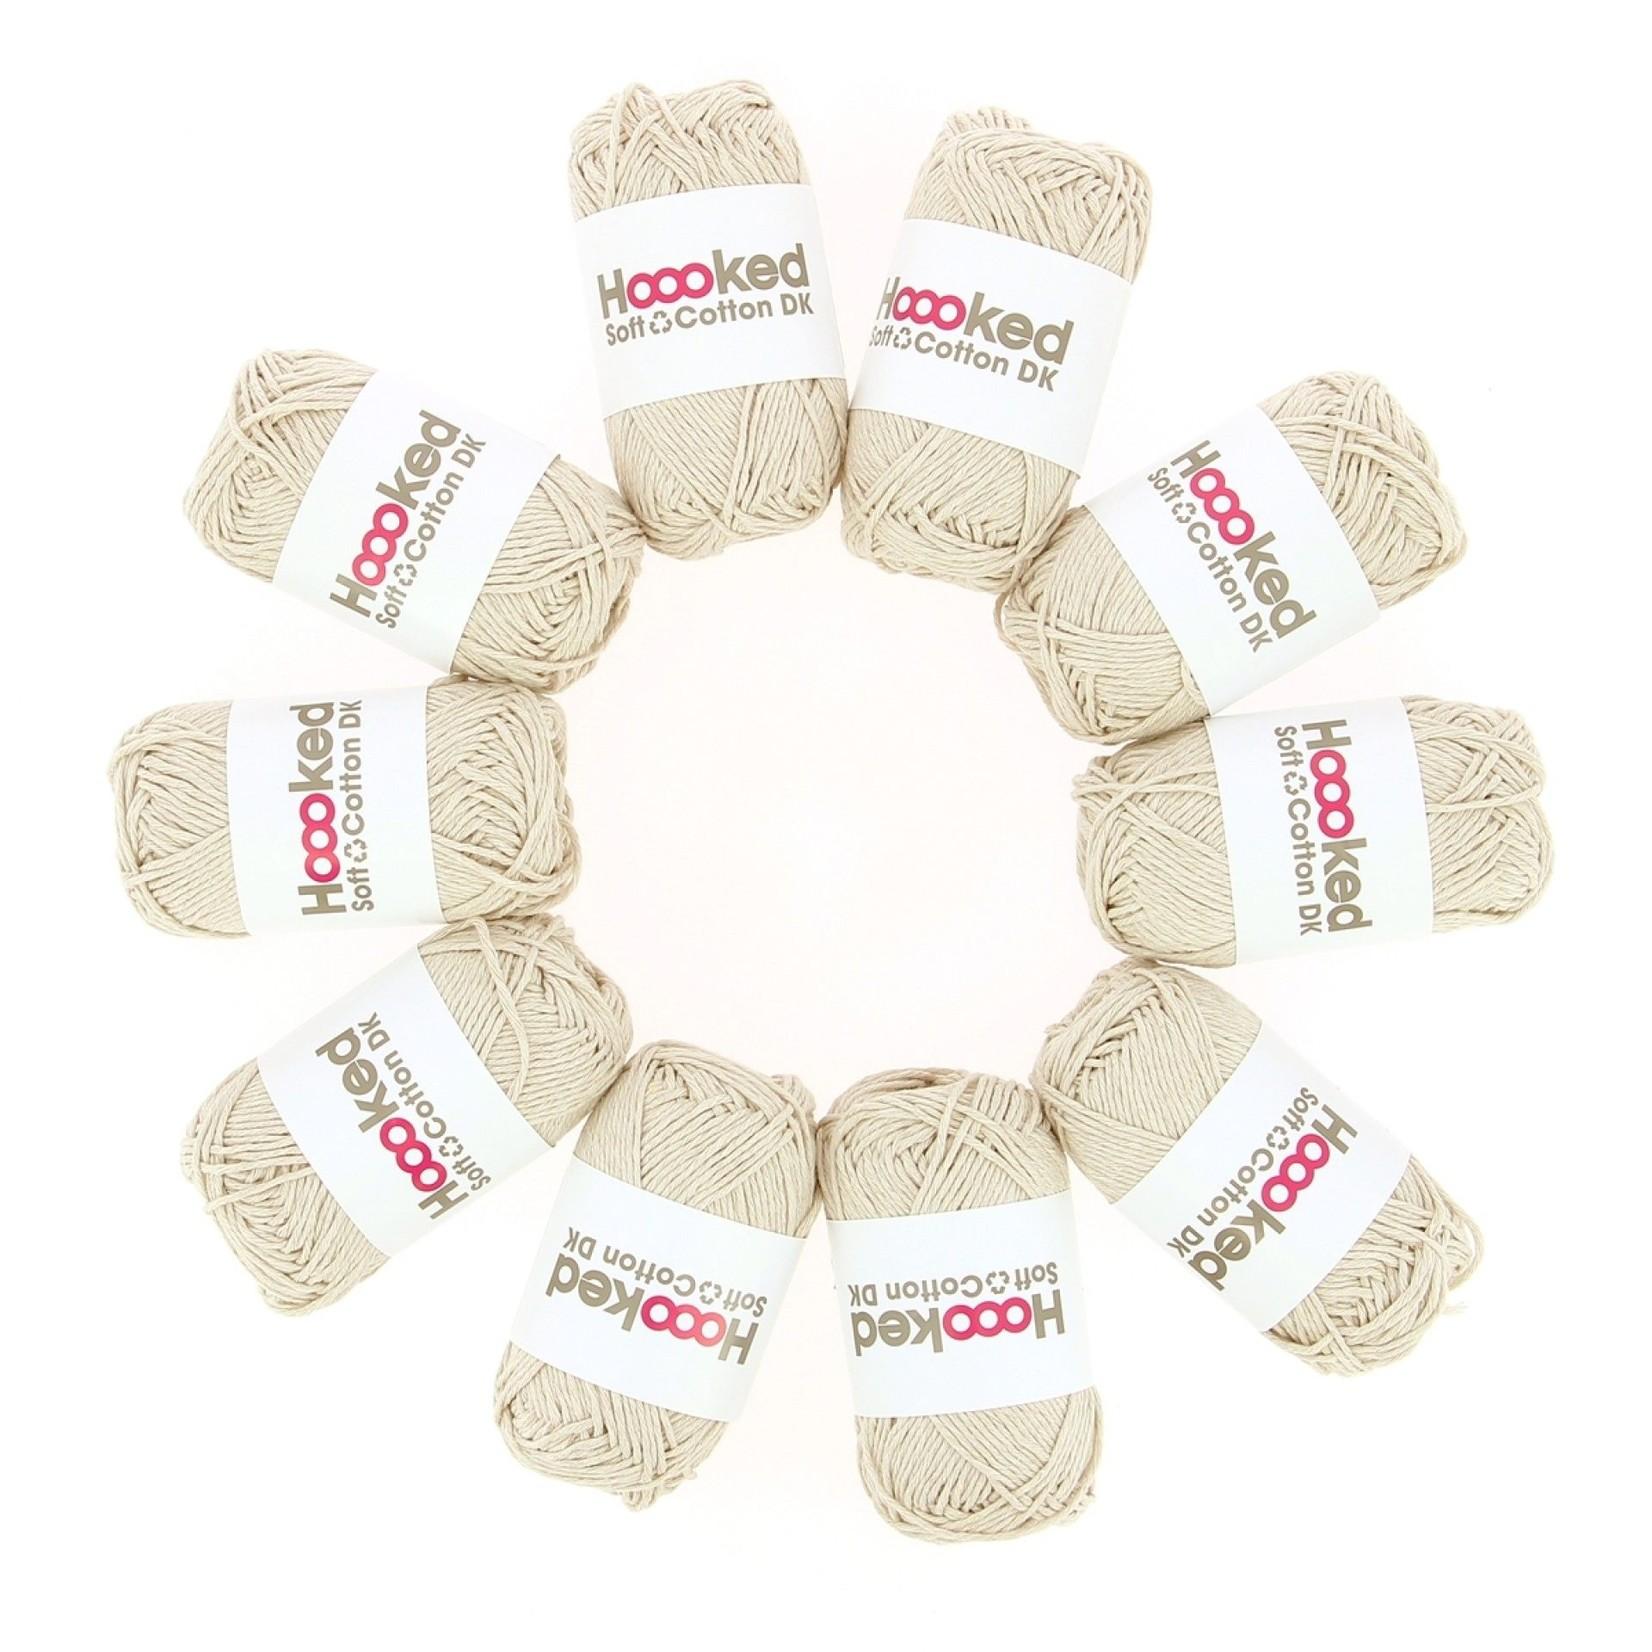 Hoooked Hoooked Soft Cotton DK California Sand bundel 5 x 50 gr. / 85 m.